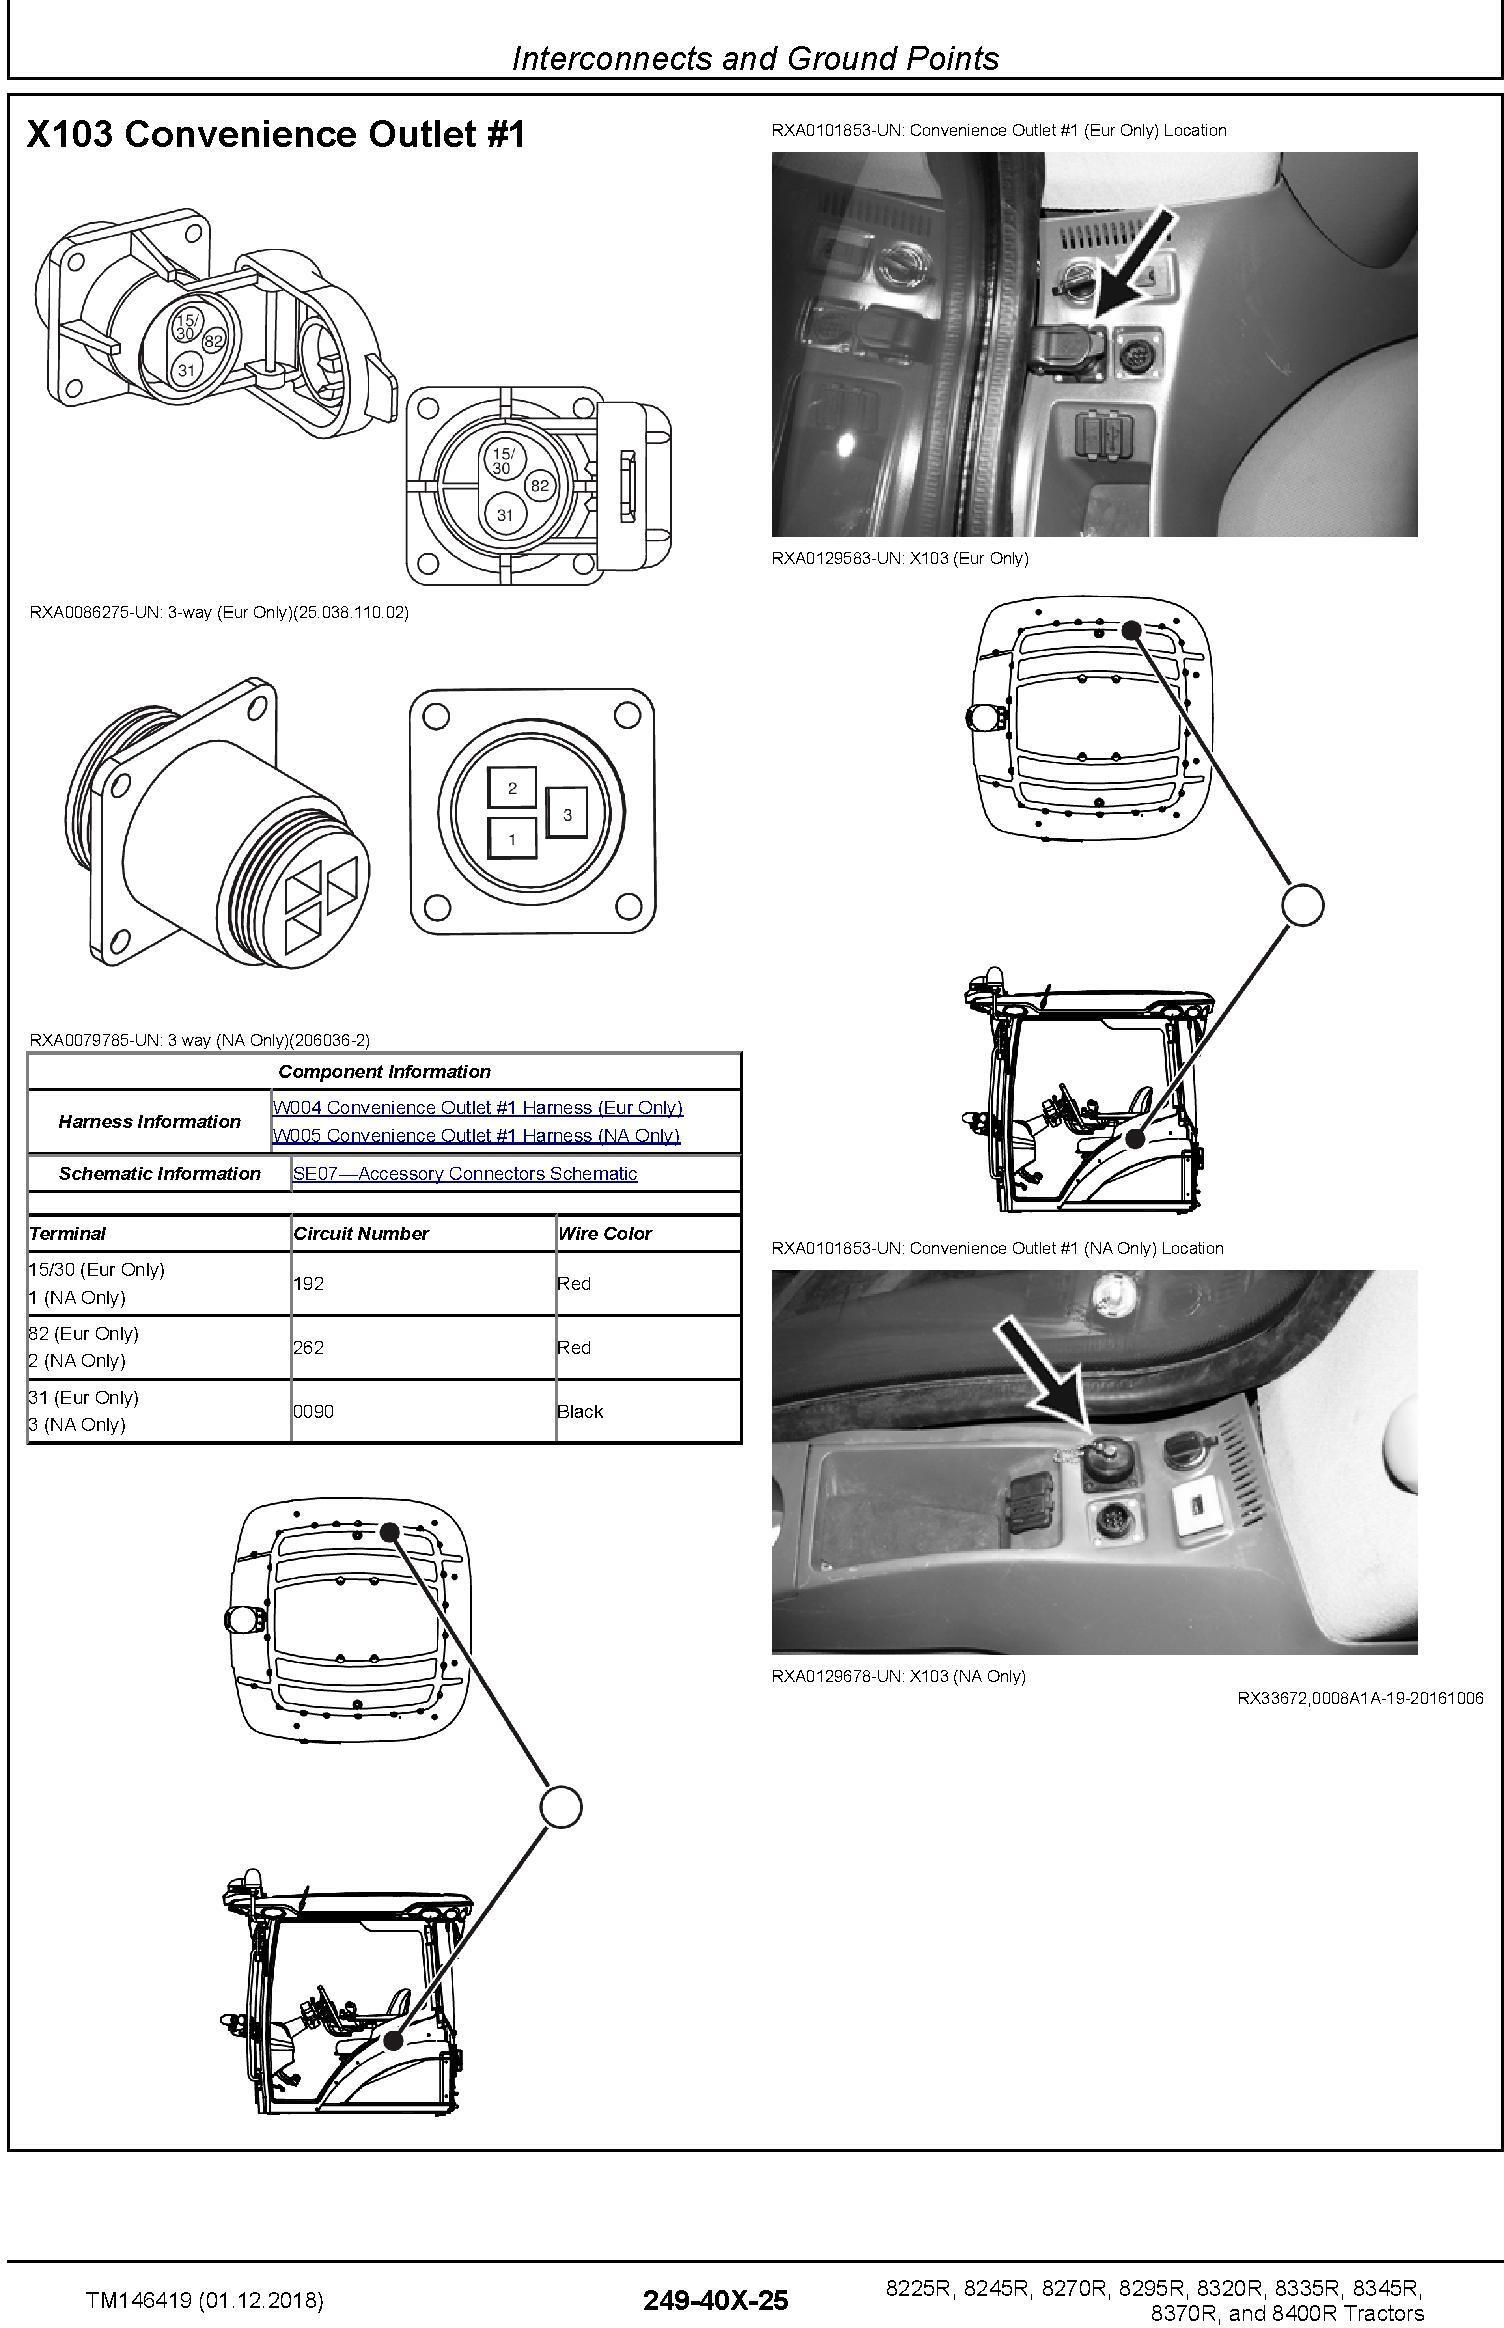 John Deere 8225R 8245R 8270R 8295R 8320R 8335R 8345R 8370R 8400R Tractors Diagnostic Manual TM146419 - 1